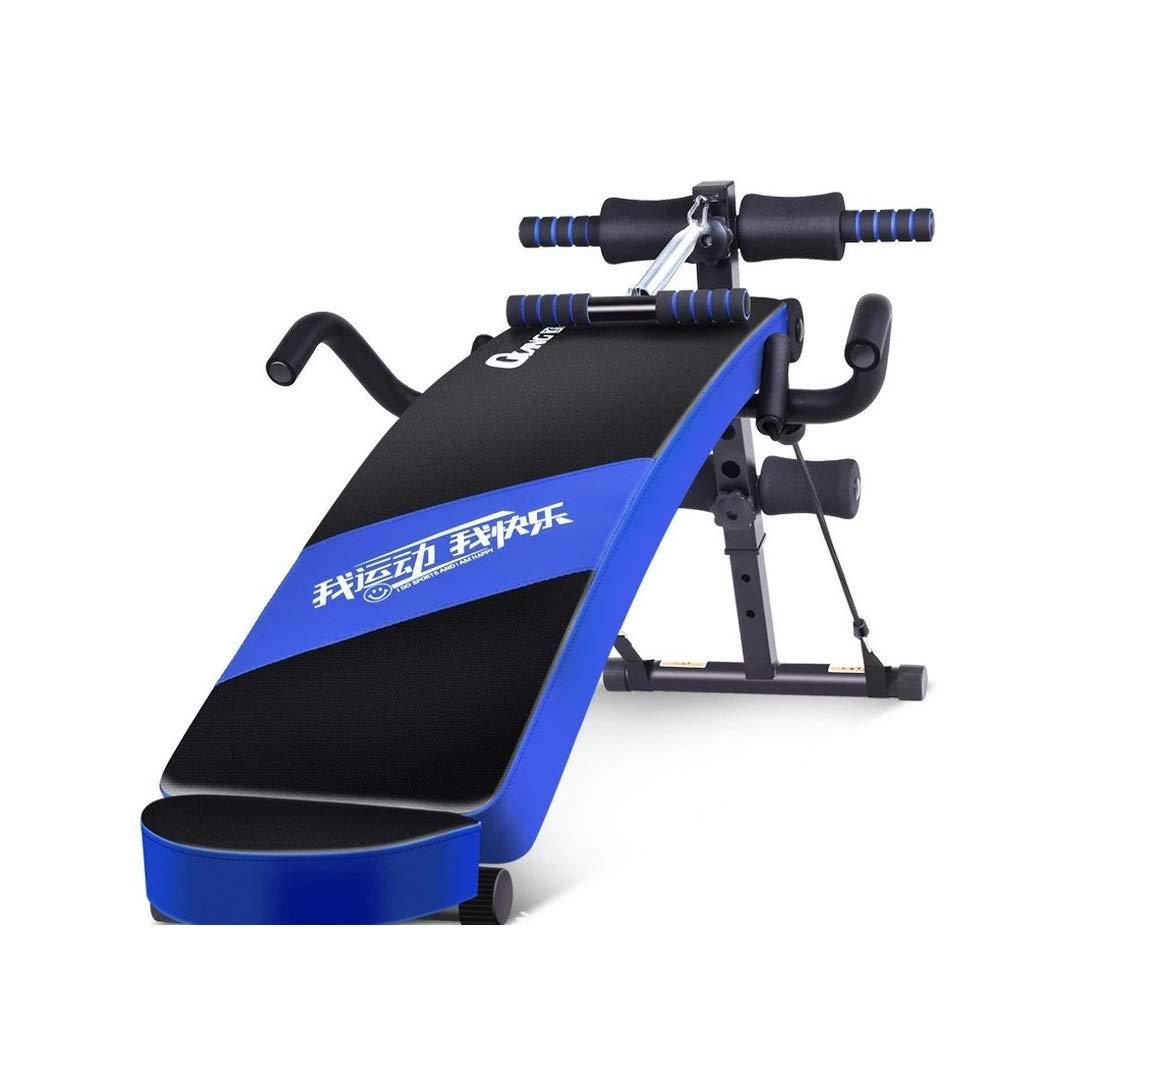 ShiMin 腹筋ボード多機能腹部ボード家庭用フィットネス機器腹部腹部マシン腹部デバイス ShiMin   B07QS1CP6F